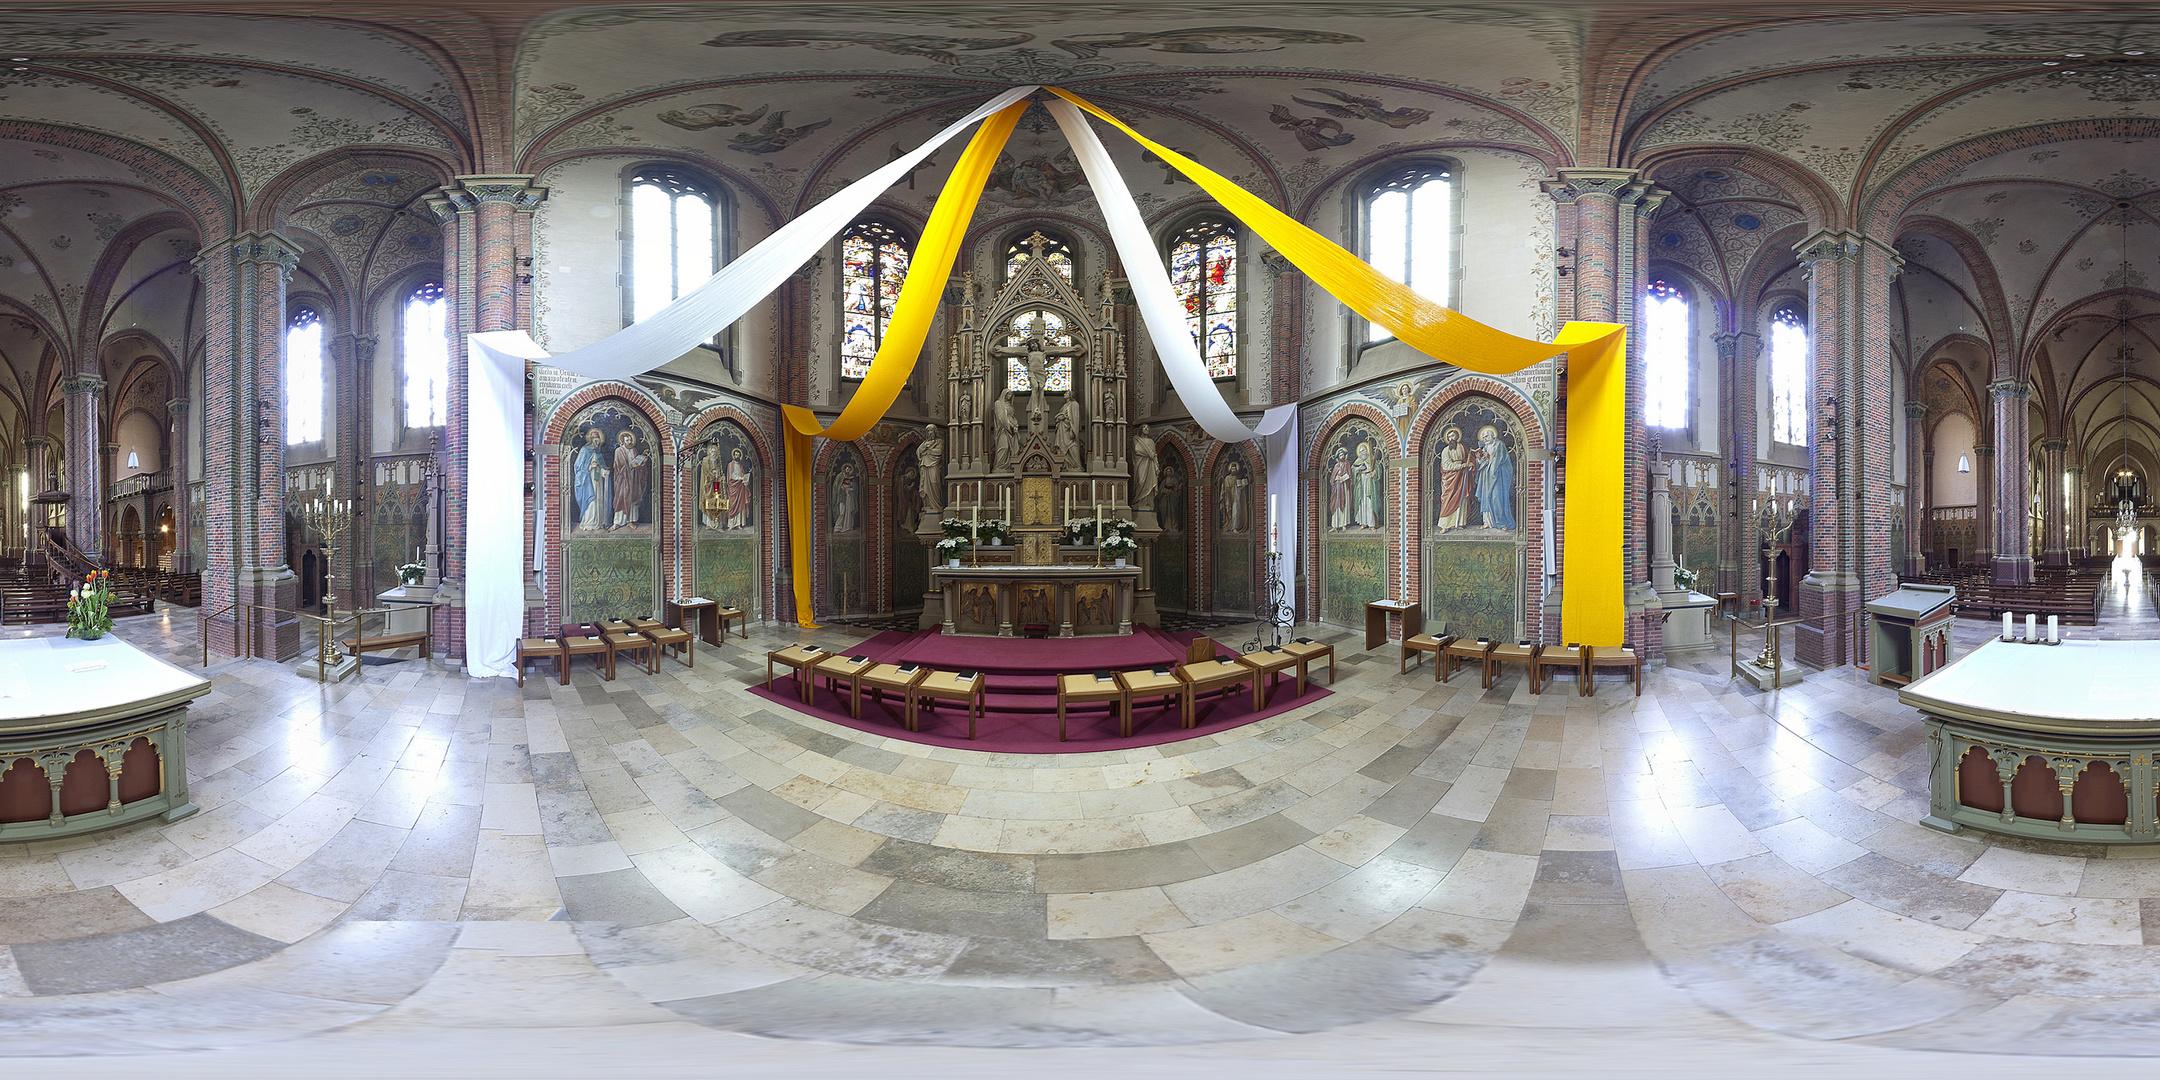 Die Antoniuskirche in Papenburg